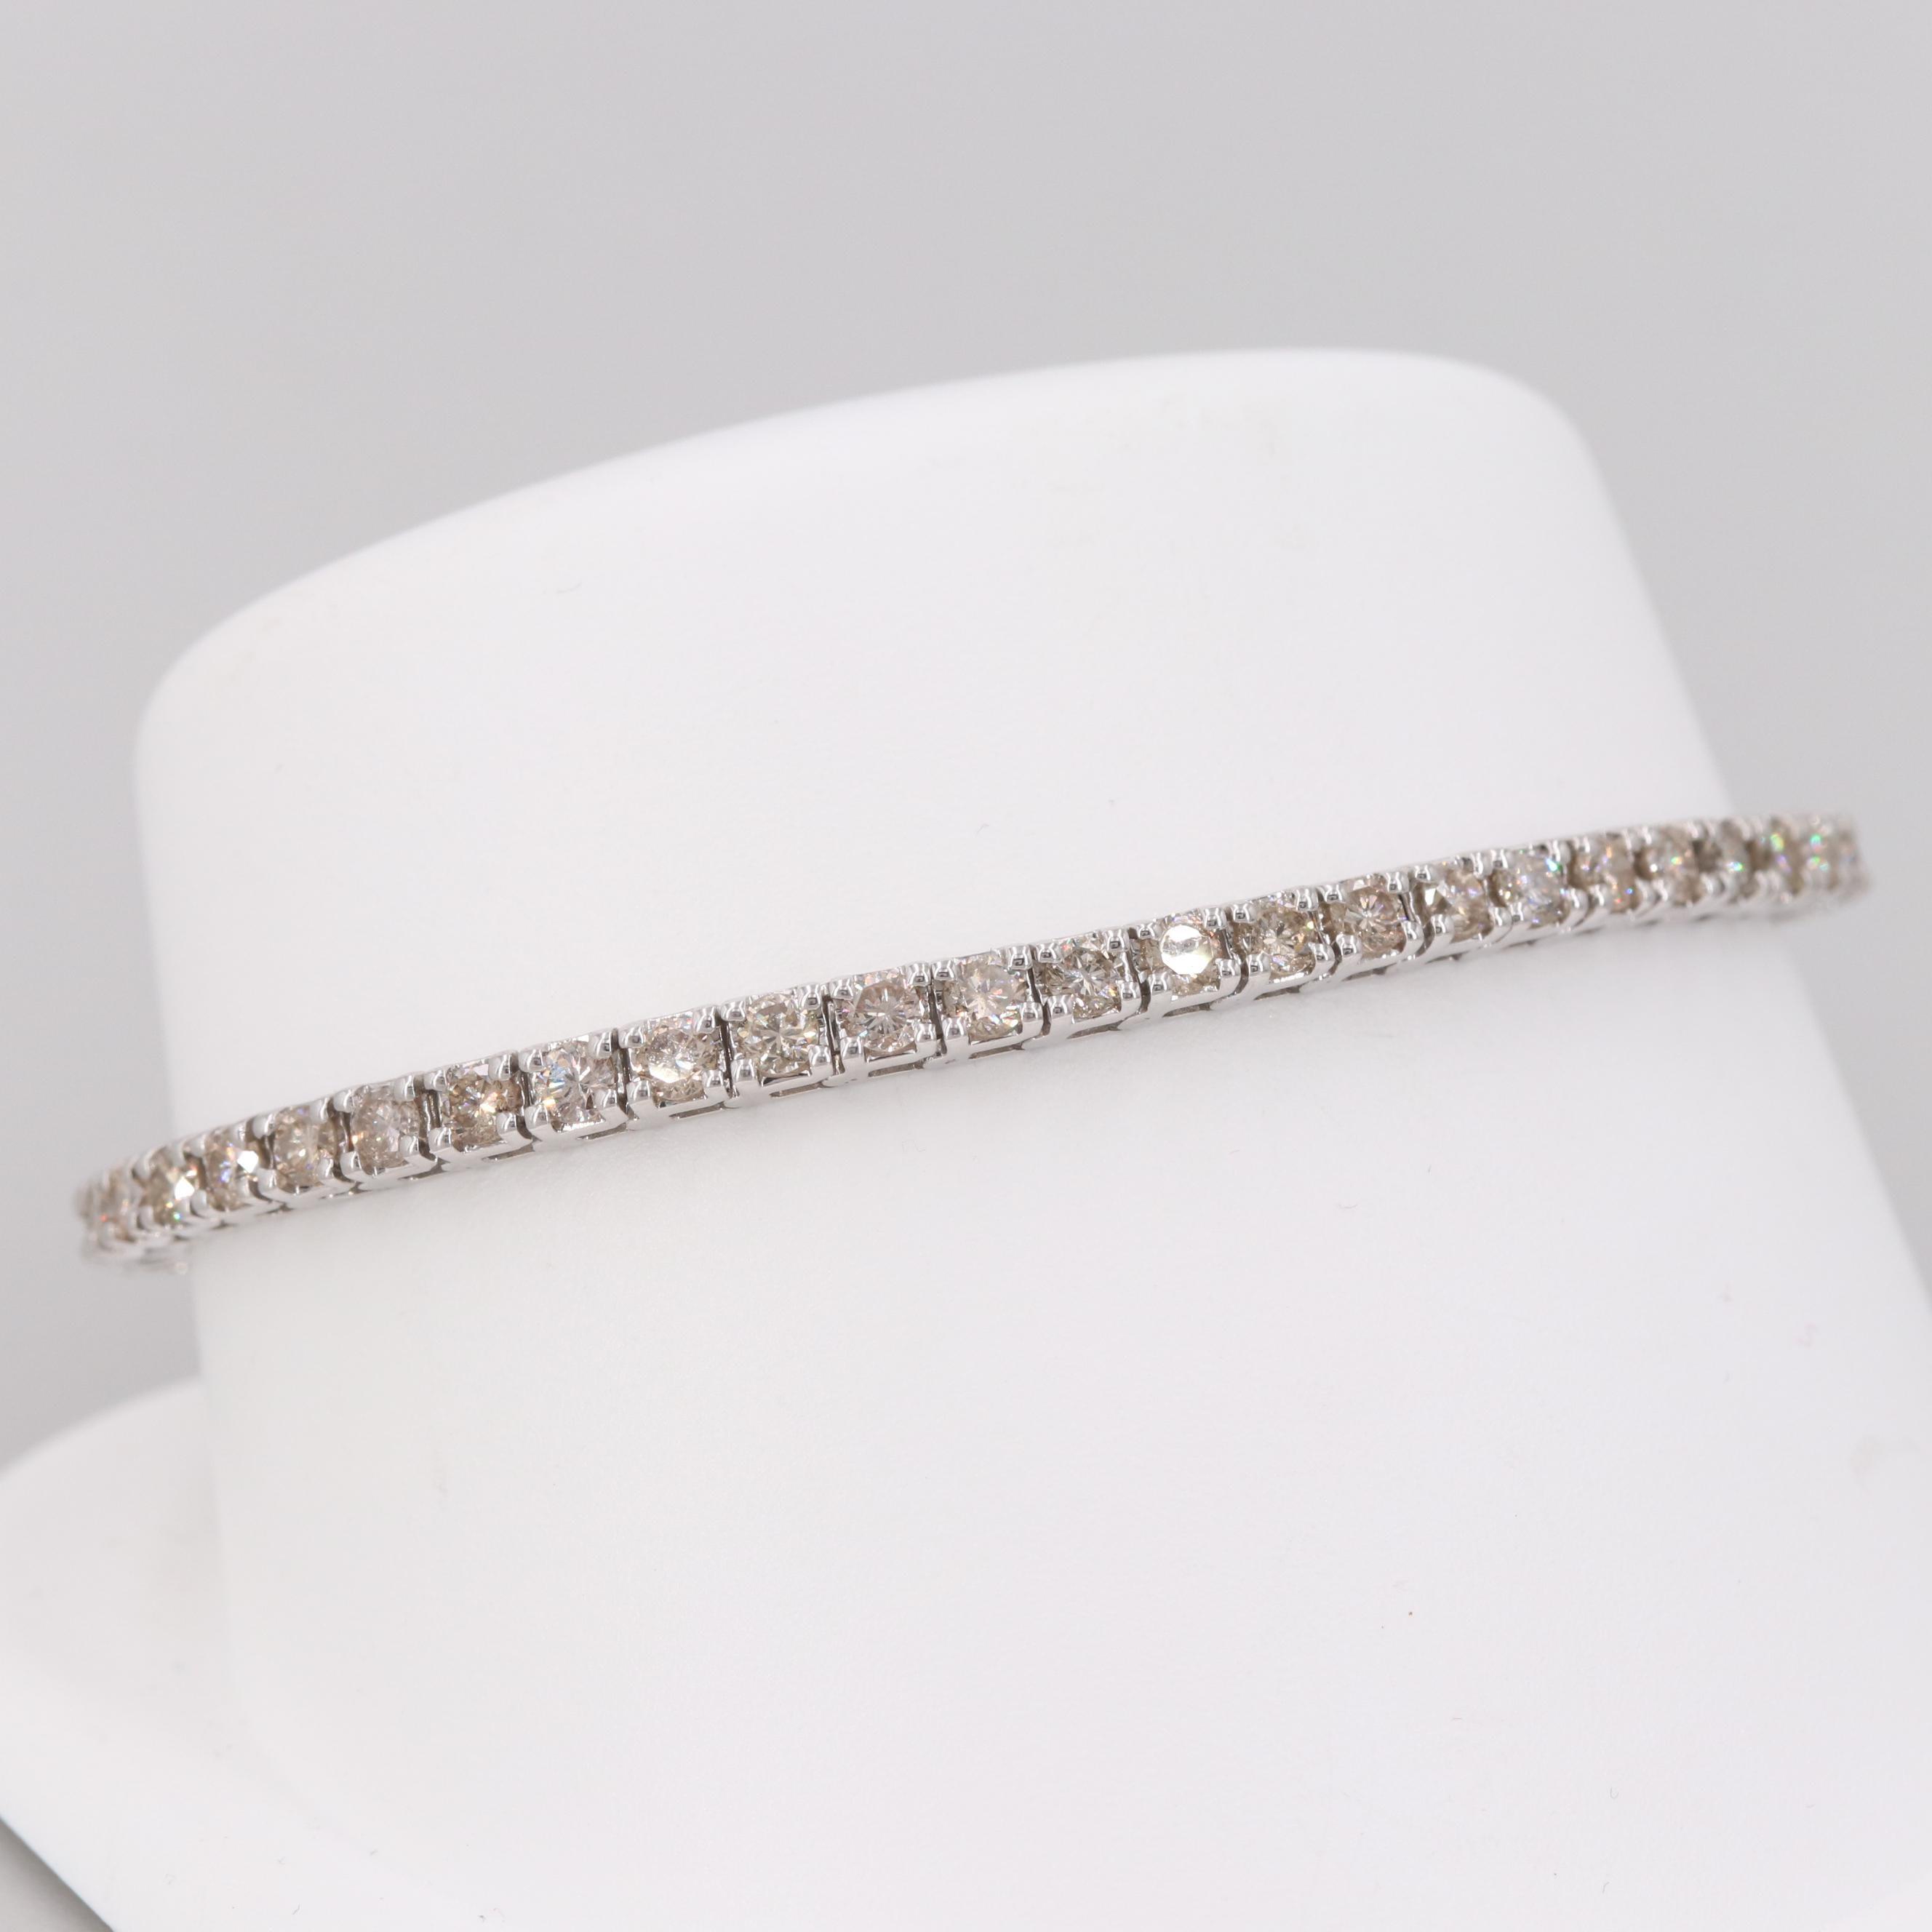 14K White Gold 3.66 CTW Diamond Bracelet